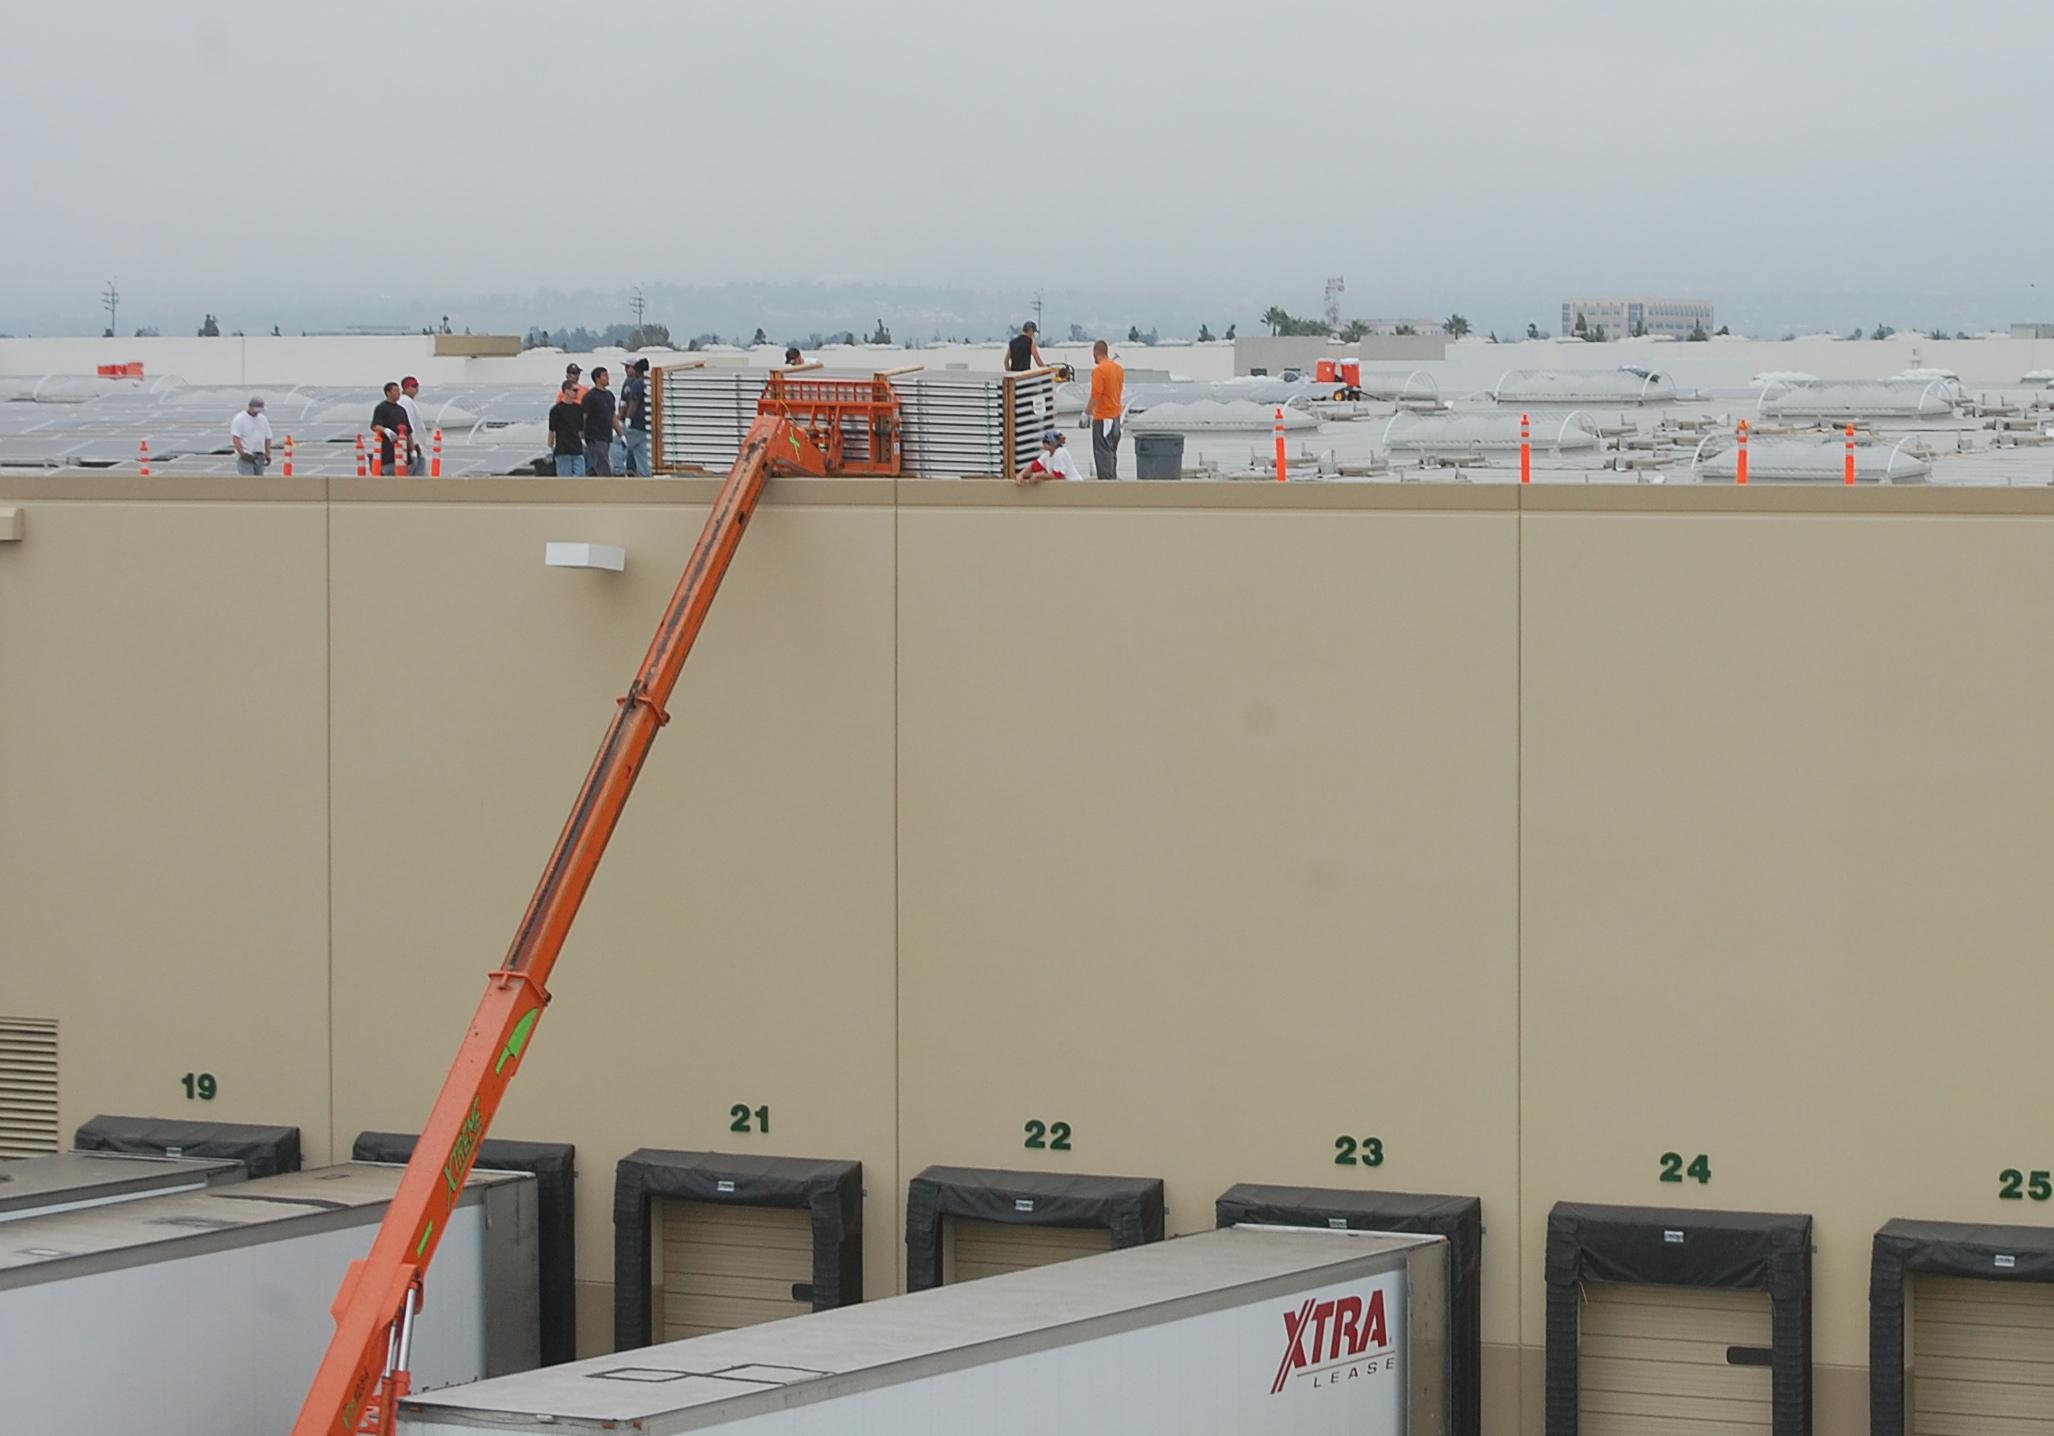 Hoisting panels onto warehouse roof. Photos: Ilsa Setziol